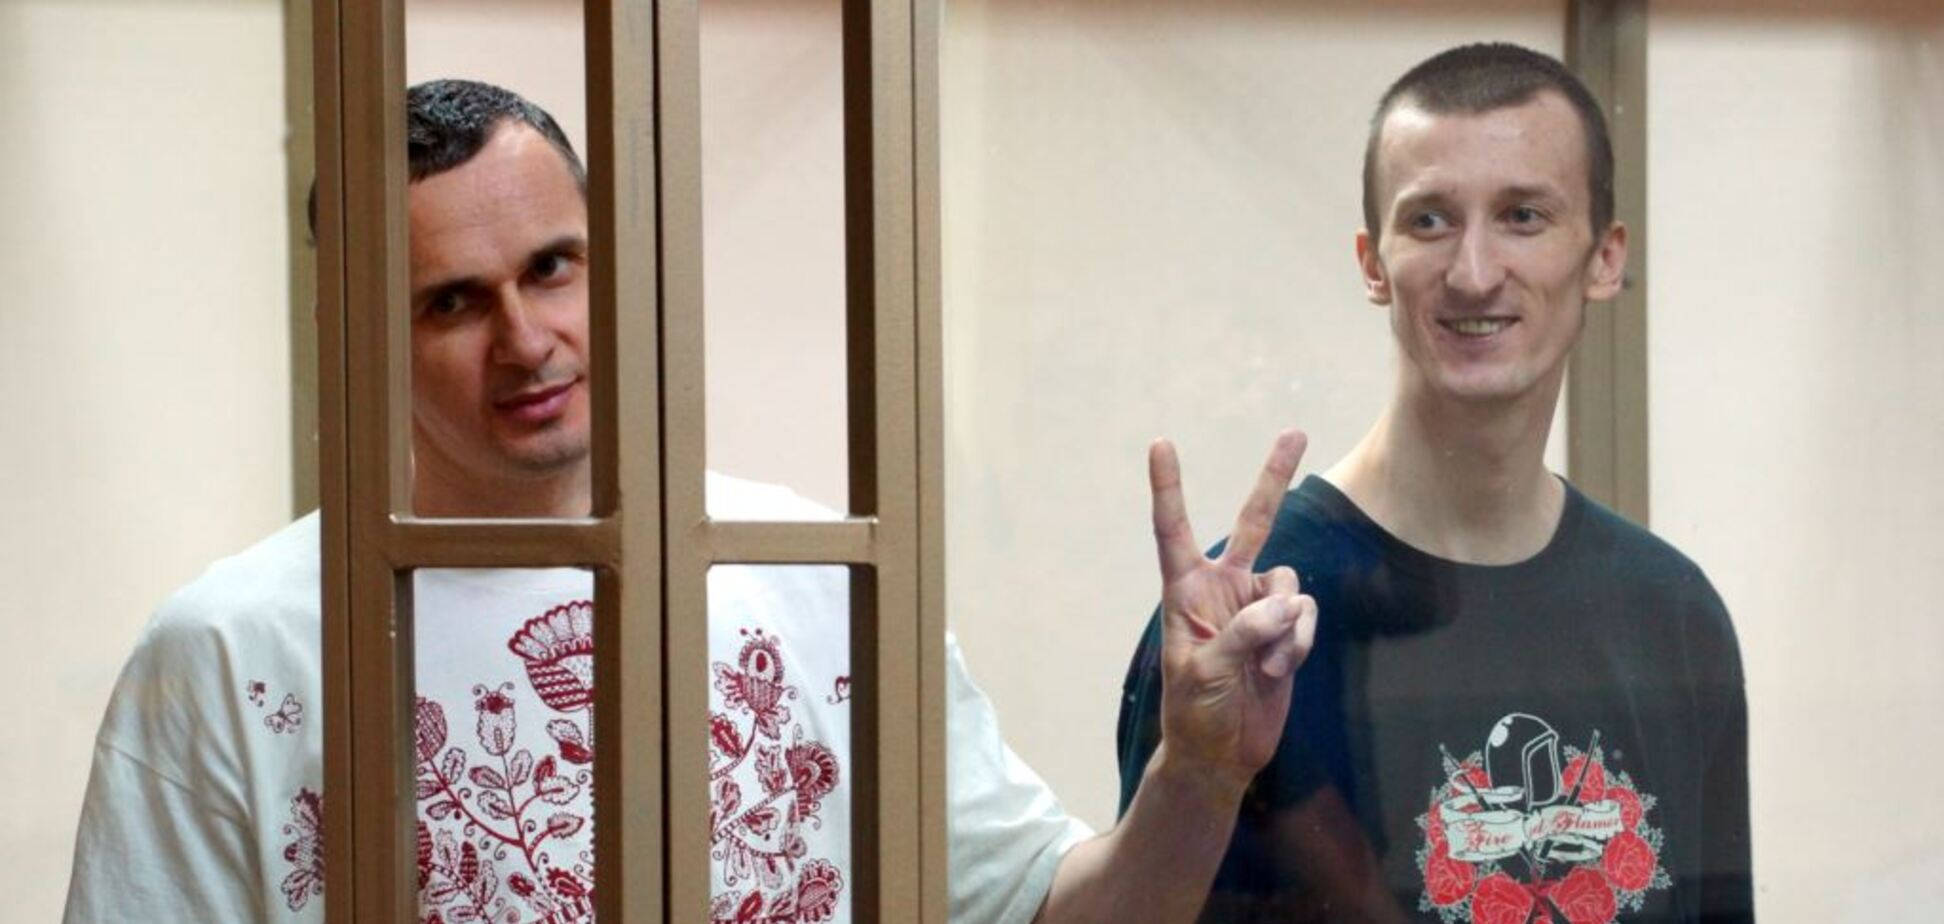 Письмо Олега Сенцова из СИЗО Кирова